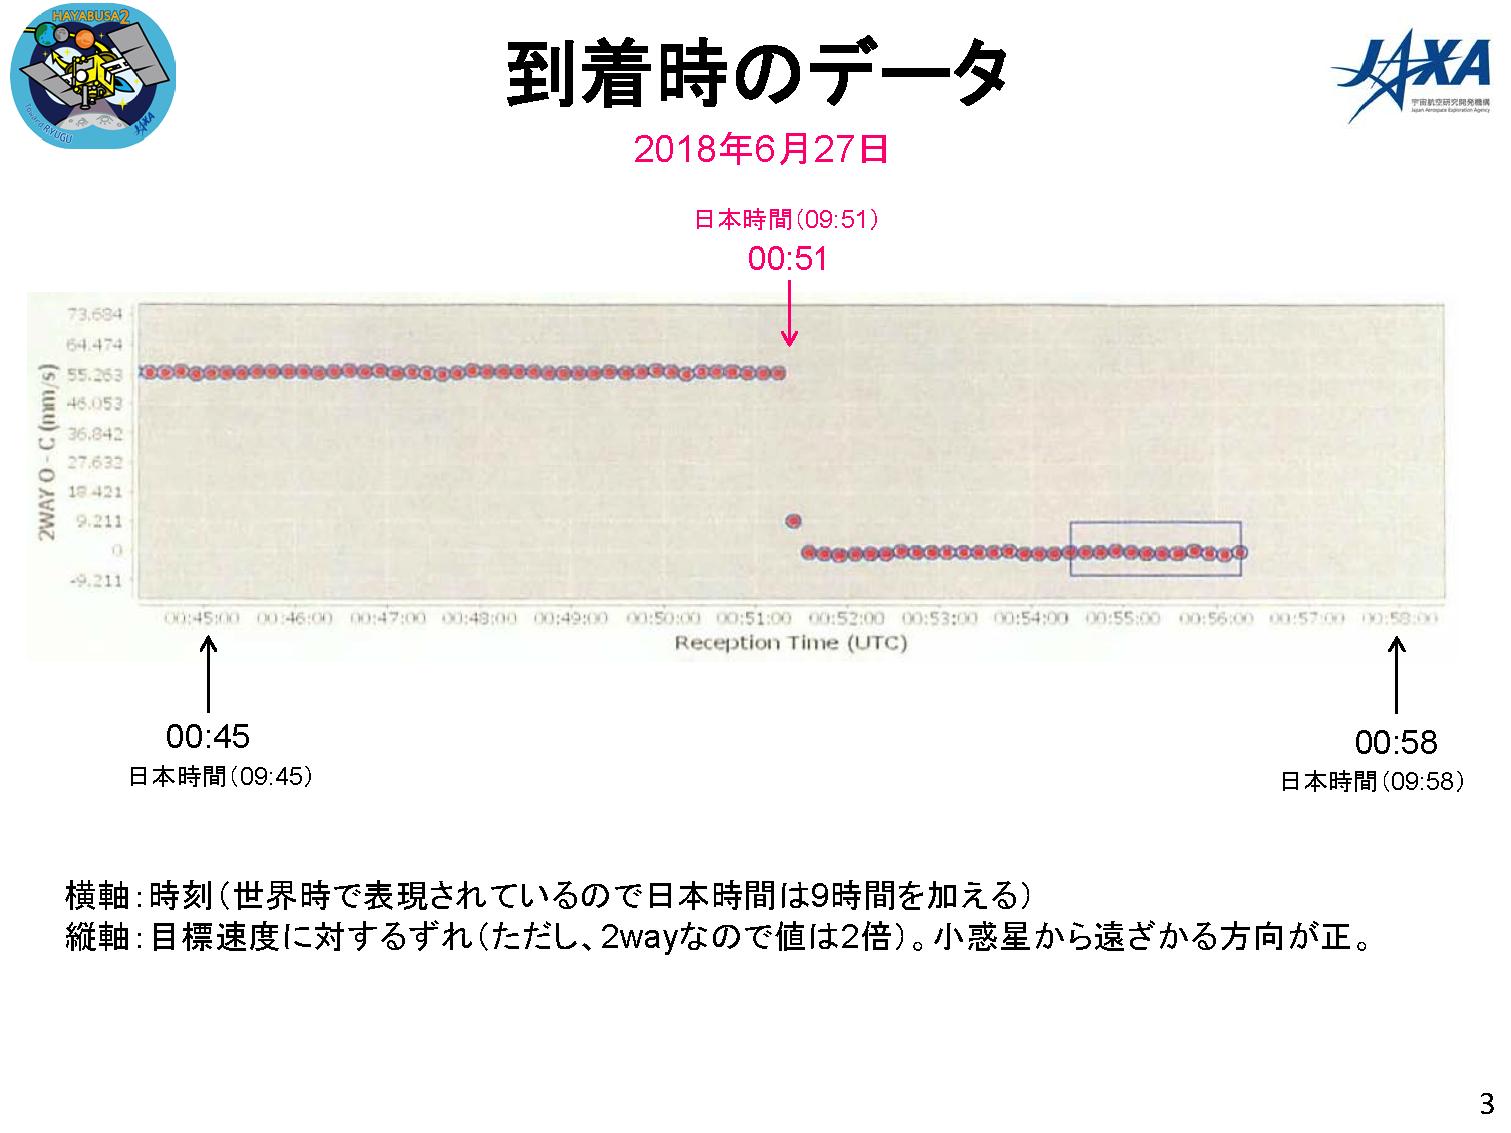 f:id:Imamura:20180627171832p:plain